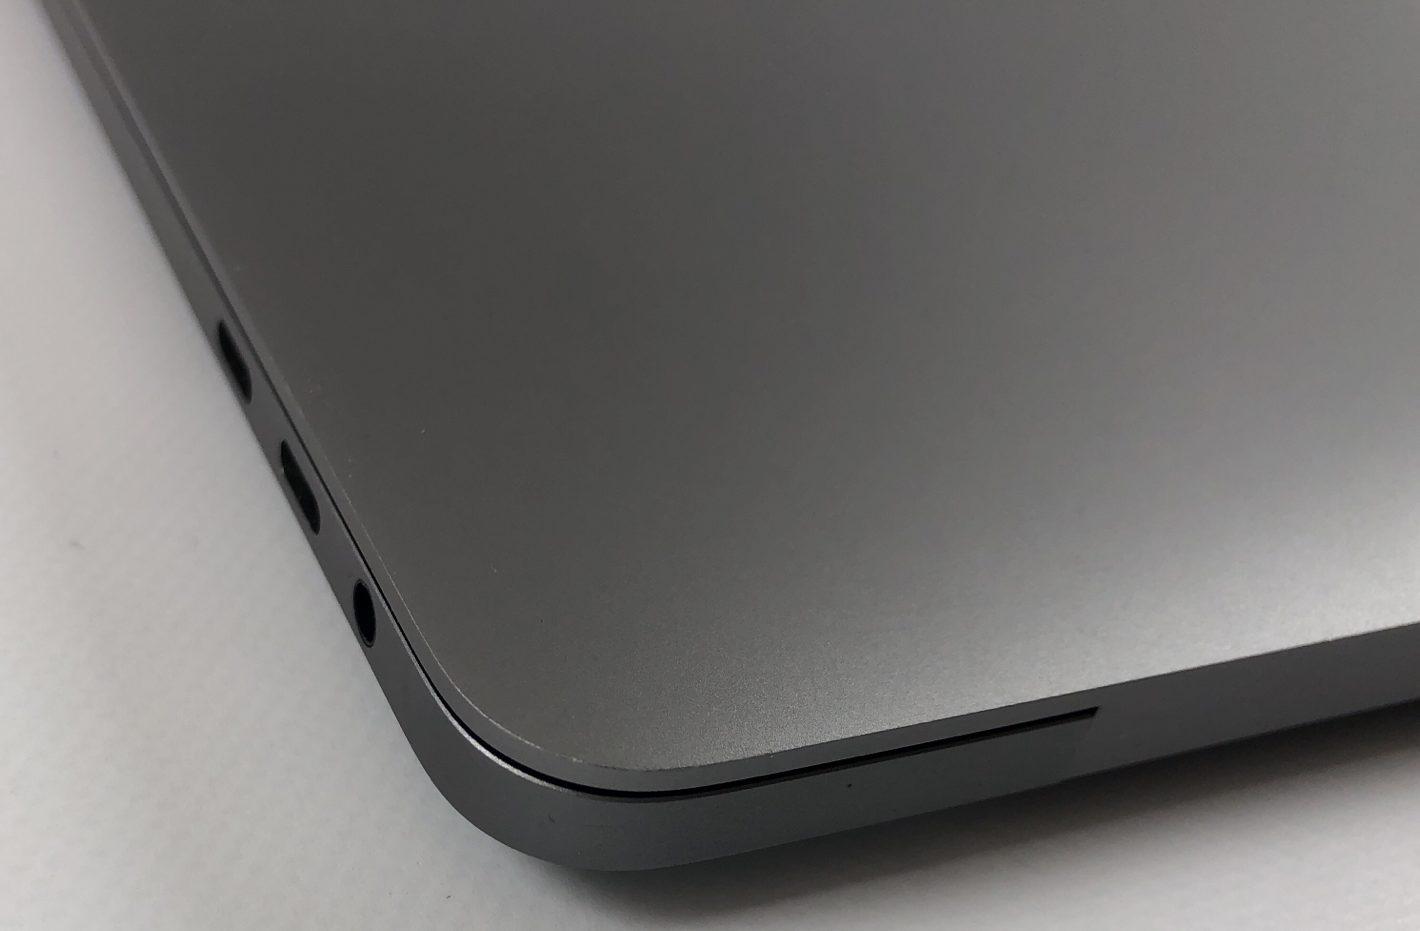 "MacBook Pro 15"" Touch Bar Mid 2017 (Intel Quad-Core i7 3.1 GHz 16 GB RAM 1 TB SSD), Space Gray, Intel Quad-Core i7 3.1 GHz, 16 GB RAM, 1 TB SSD, image 3"